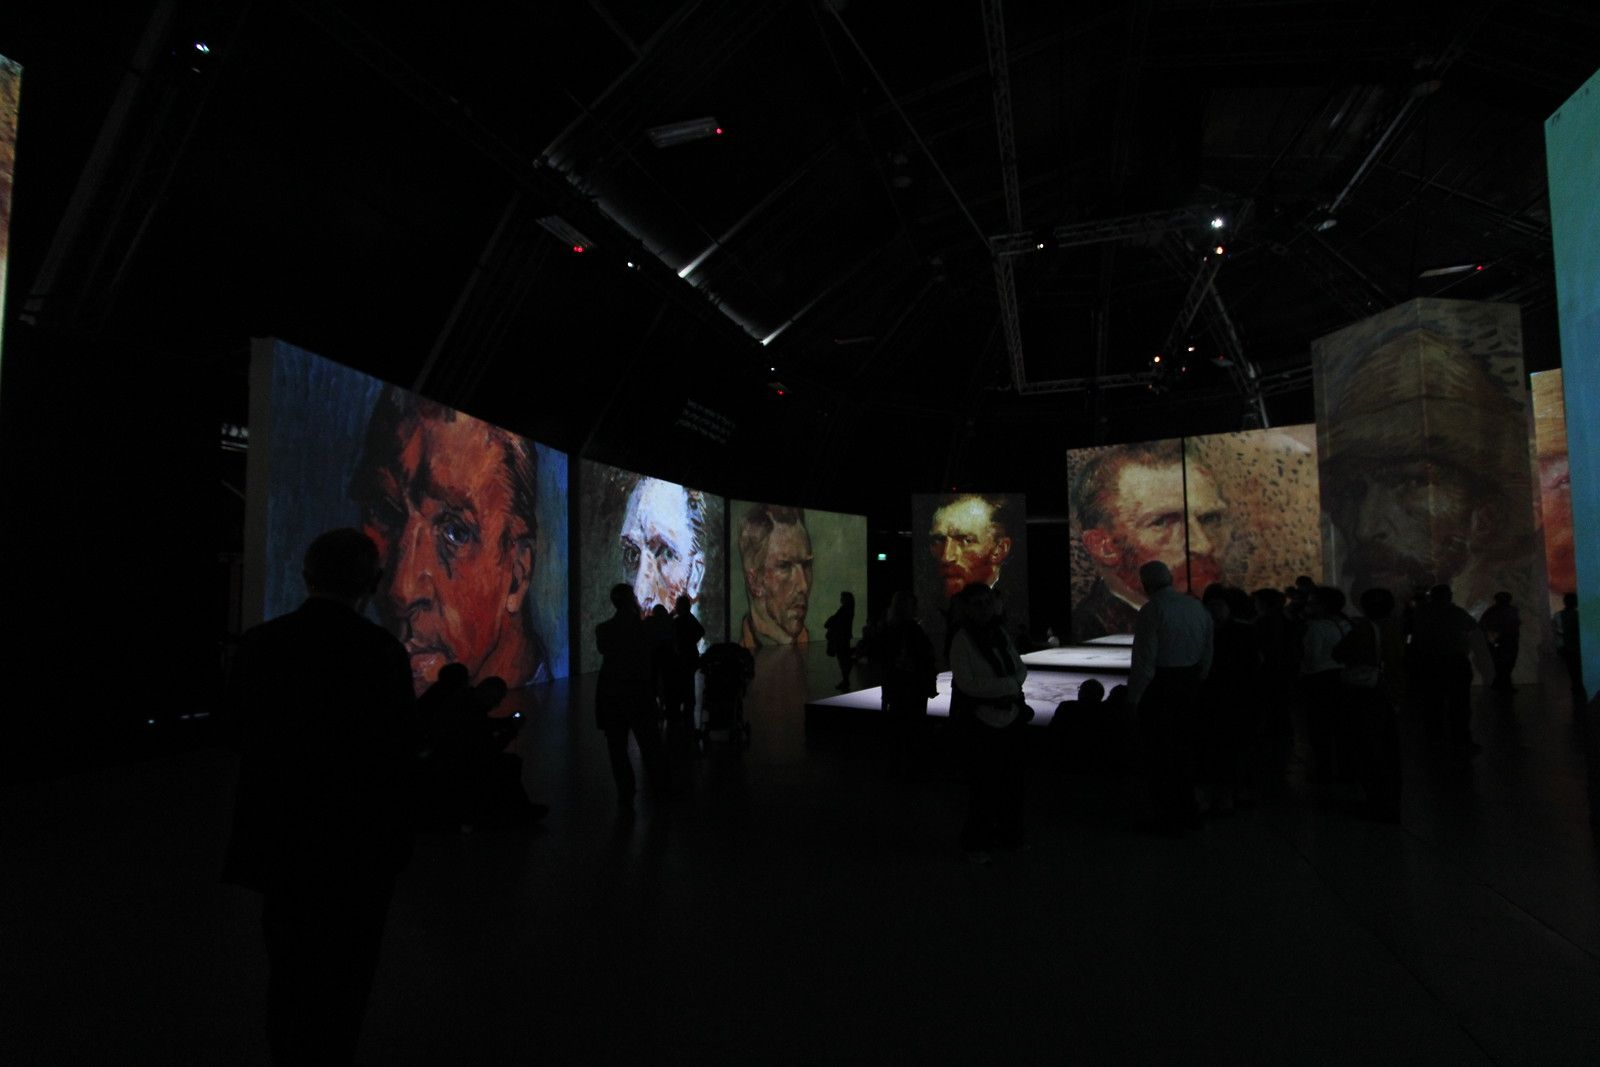 Van Gogh Alive Immersive Multimedia Exhibition Event Marketing Marketing Trends Pretty Pictures